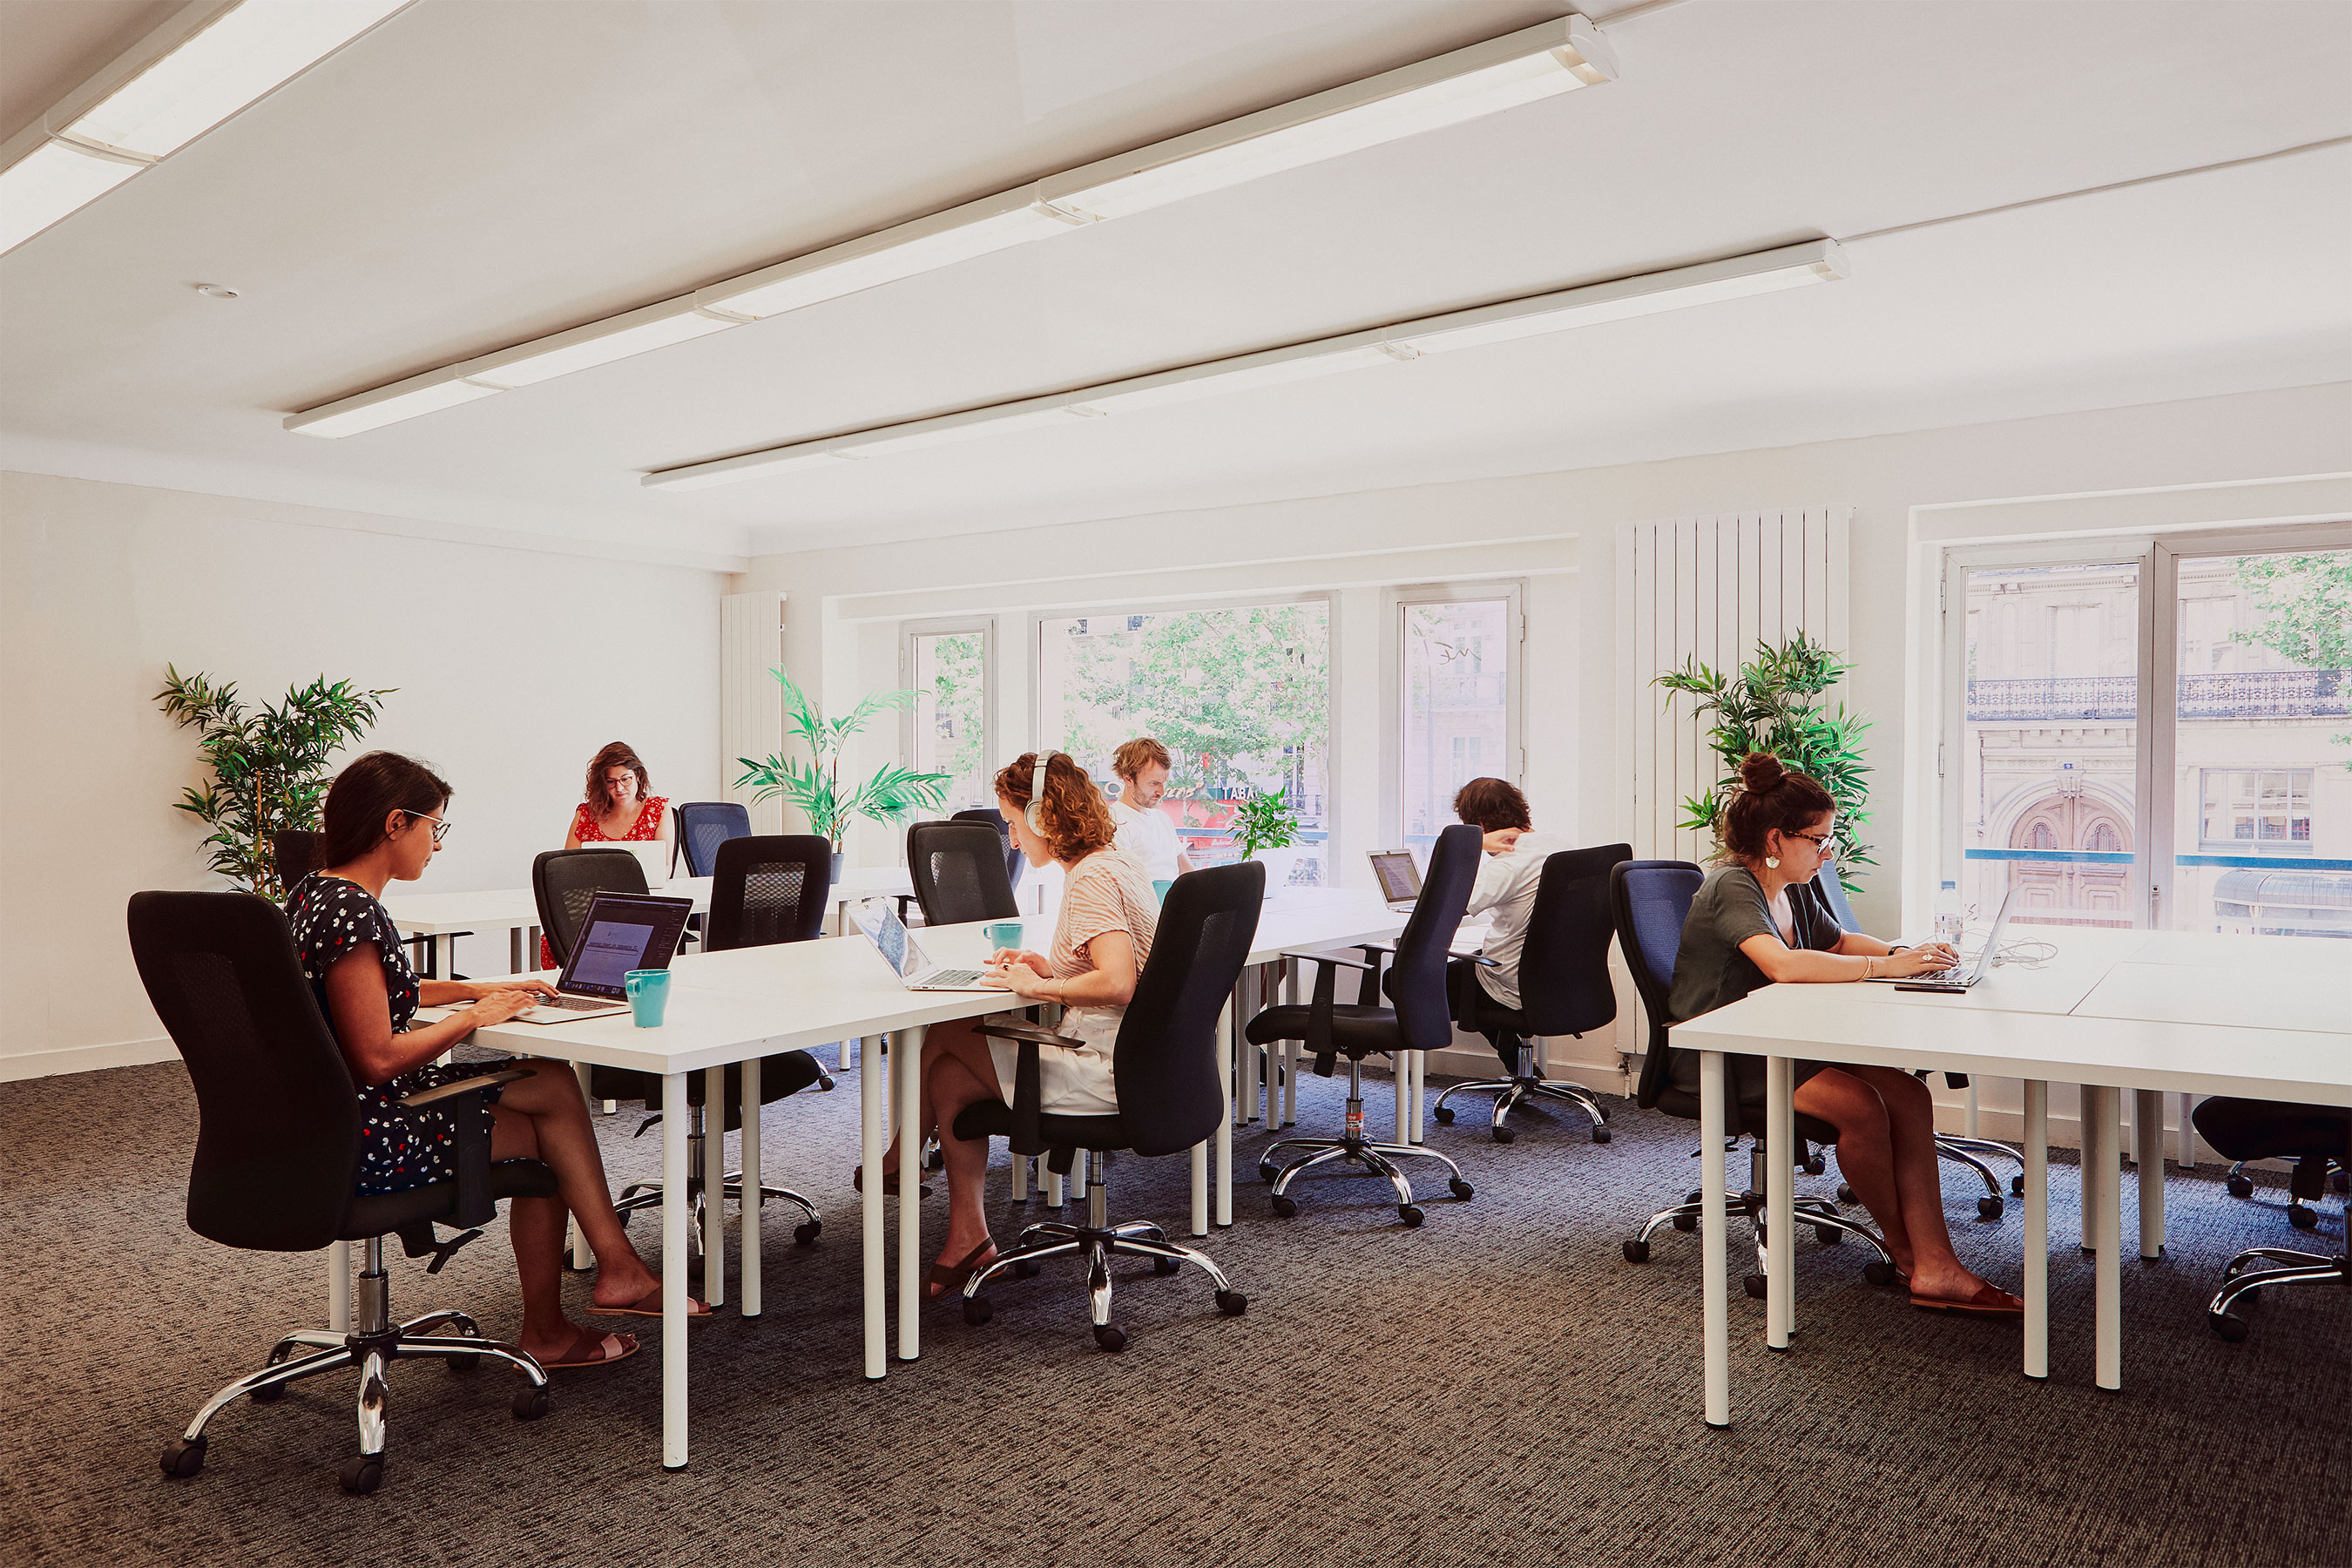 coworking strasbourg saint denis - Bureau privé